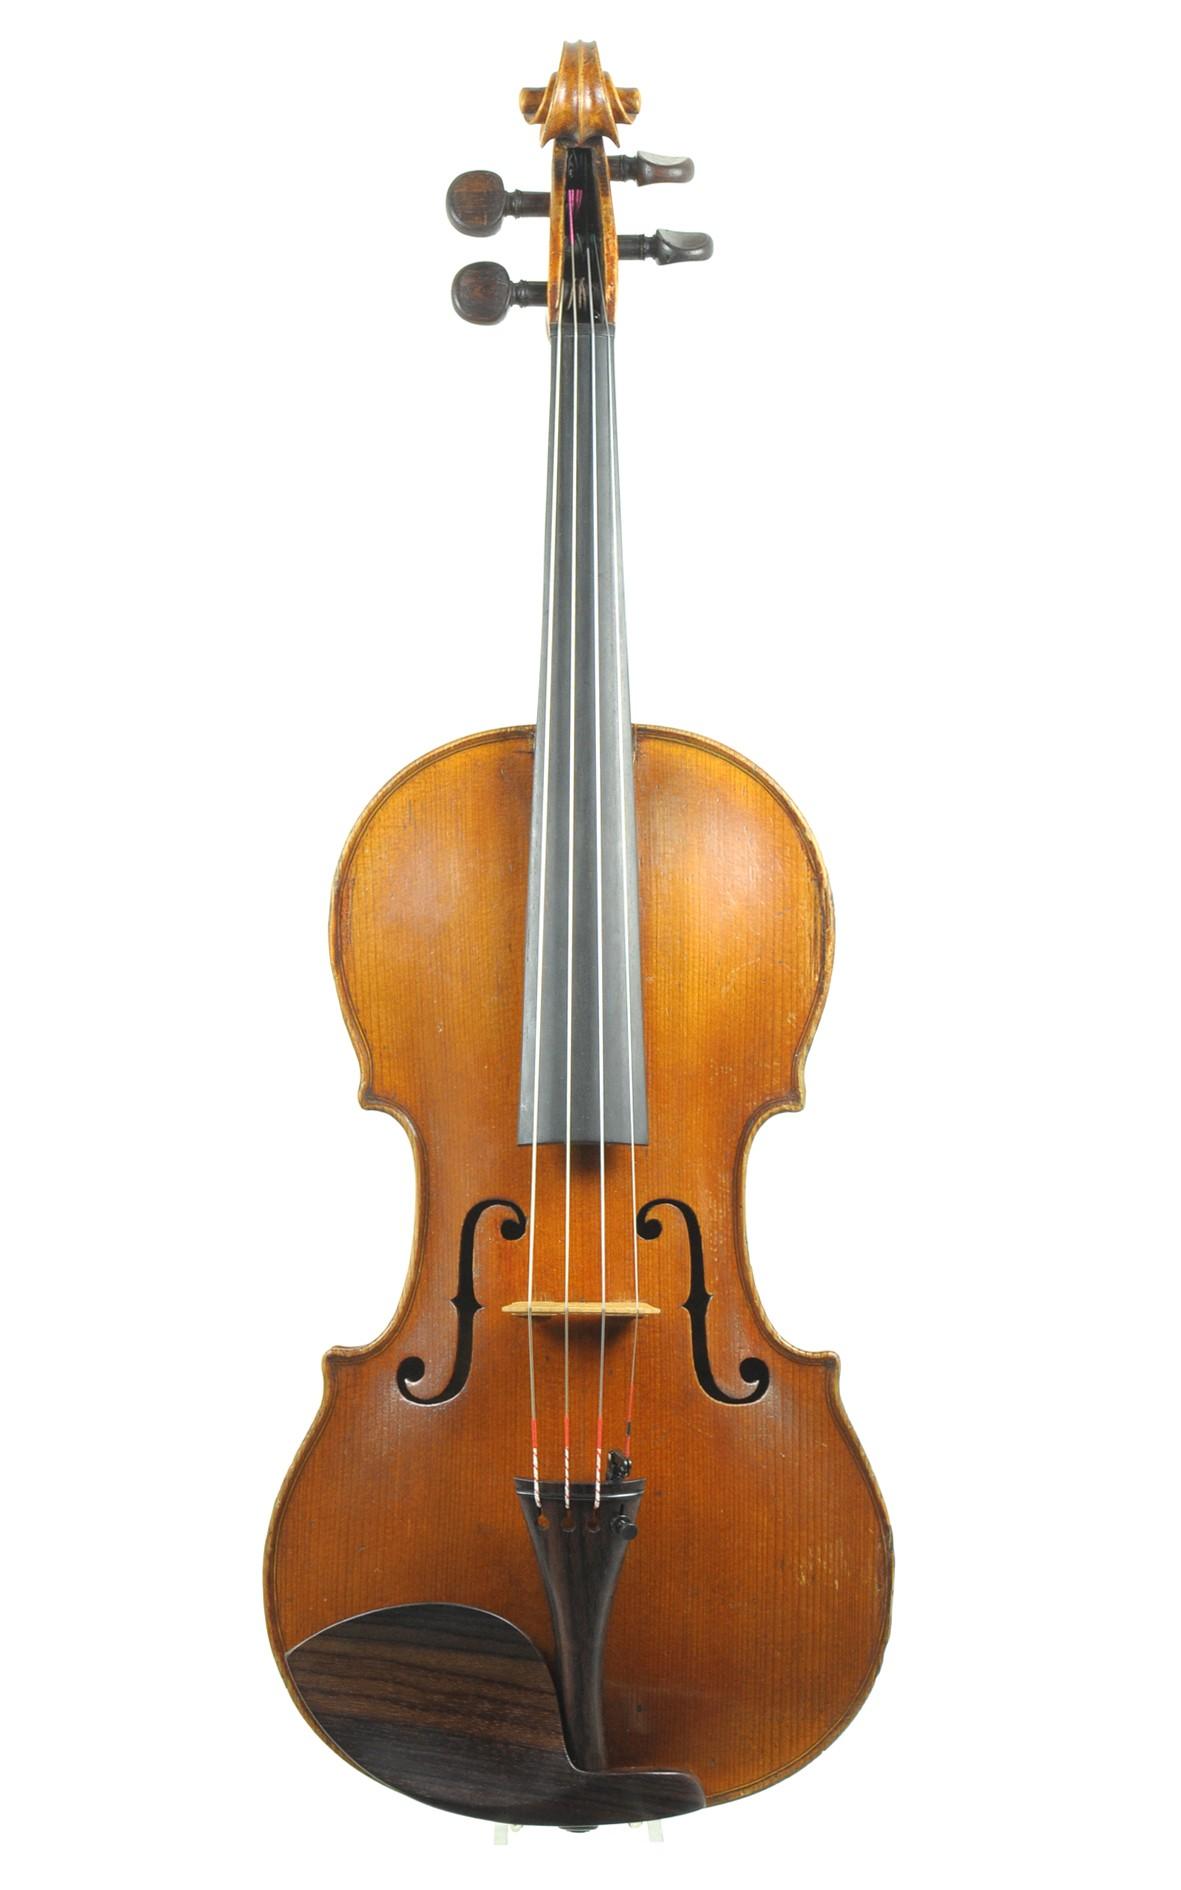 Violin by Claude-François Vuillaume, Mirecourt